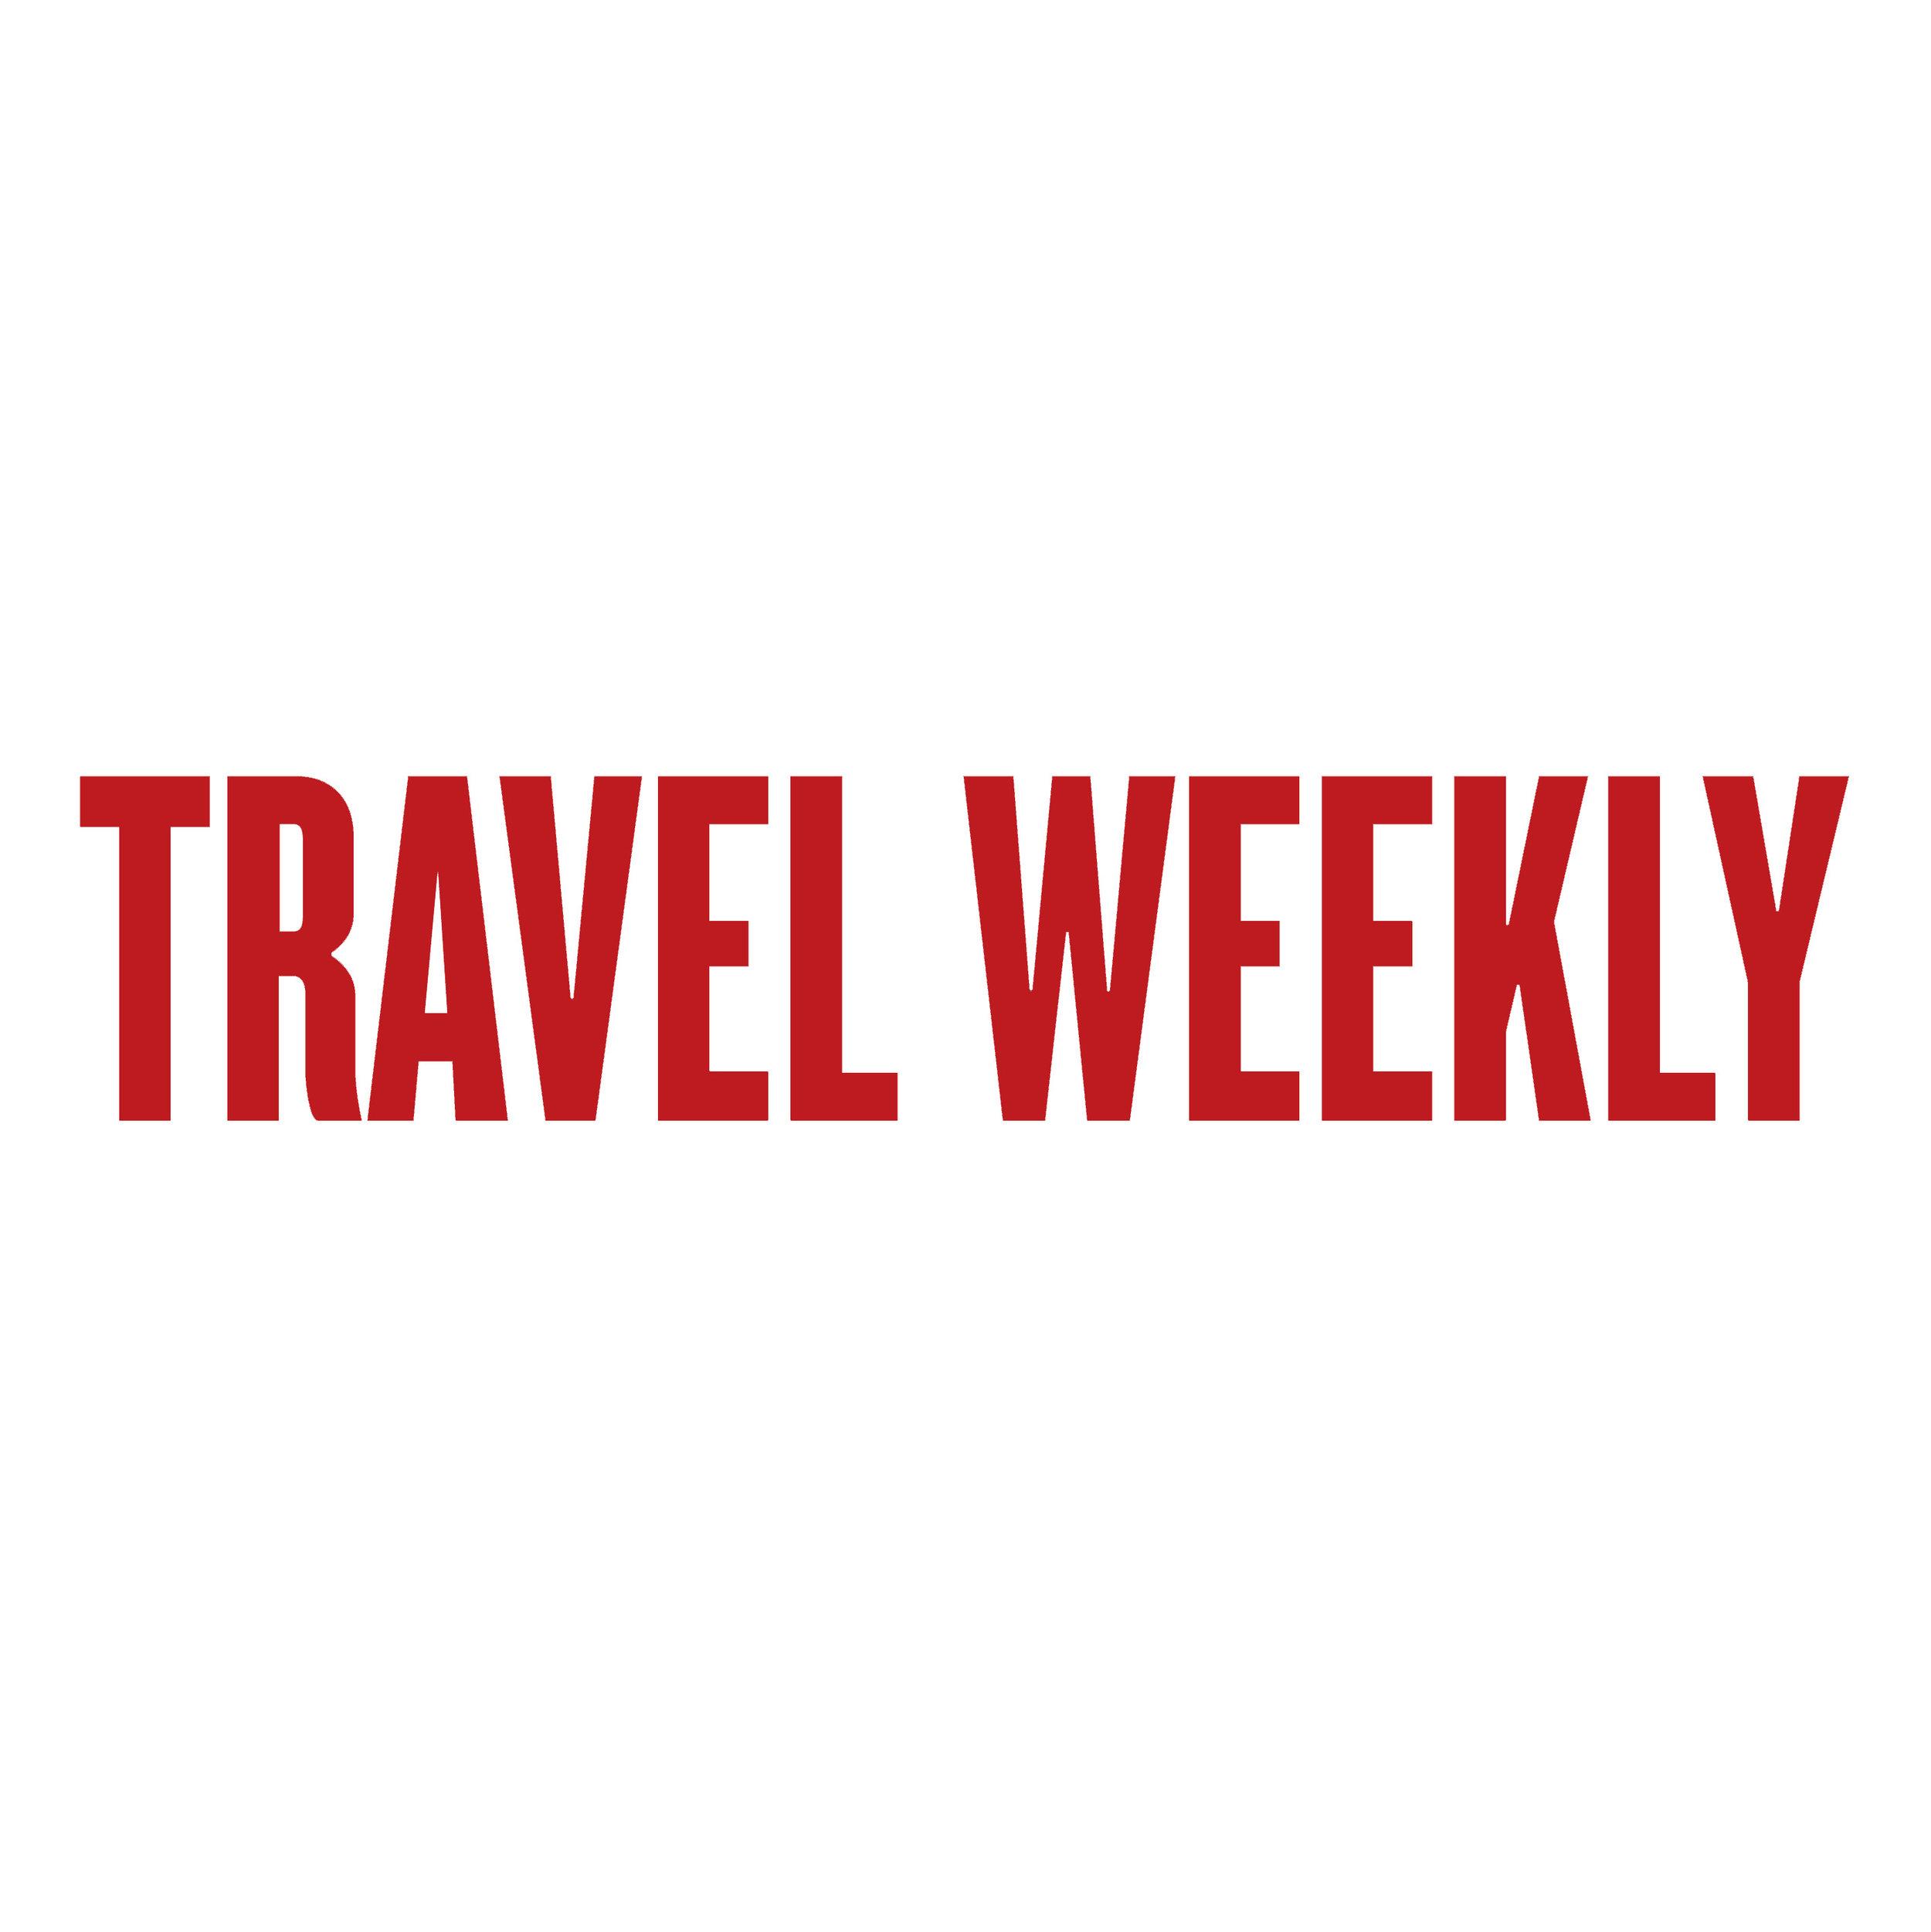 PF_travel weekly.jpg